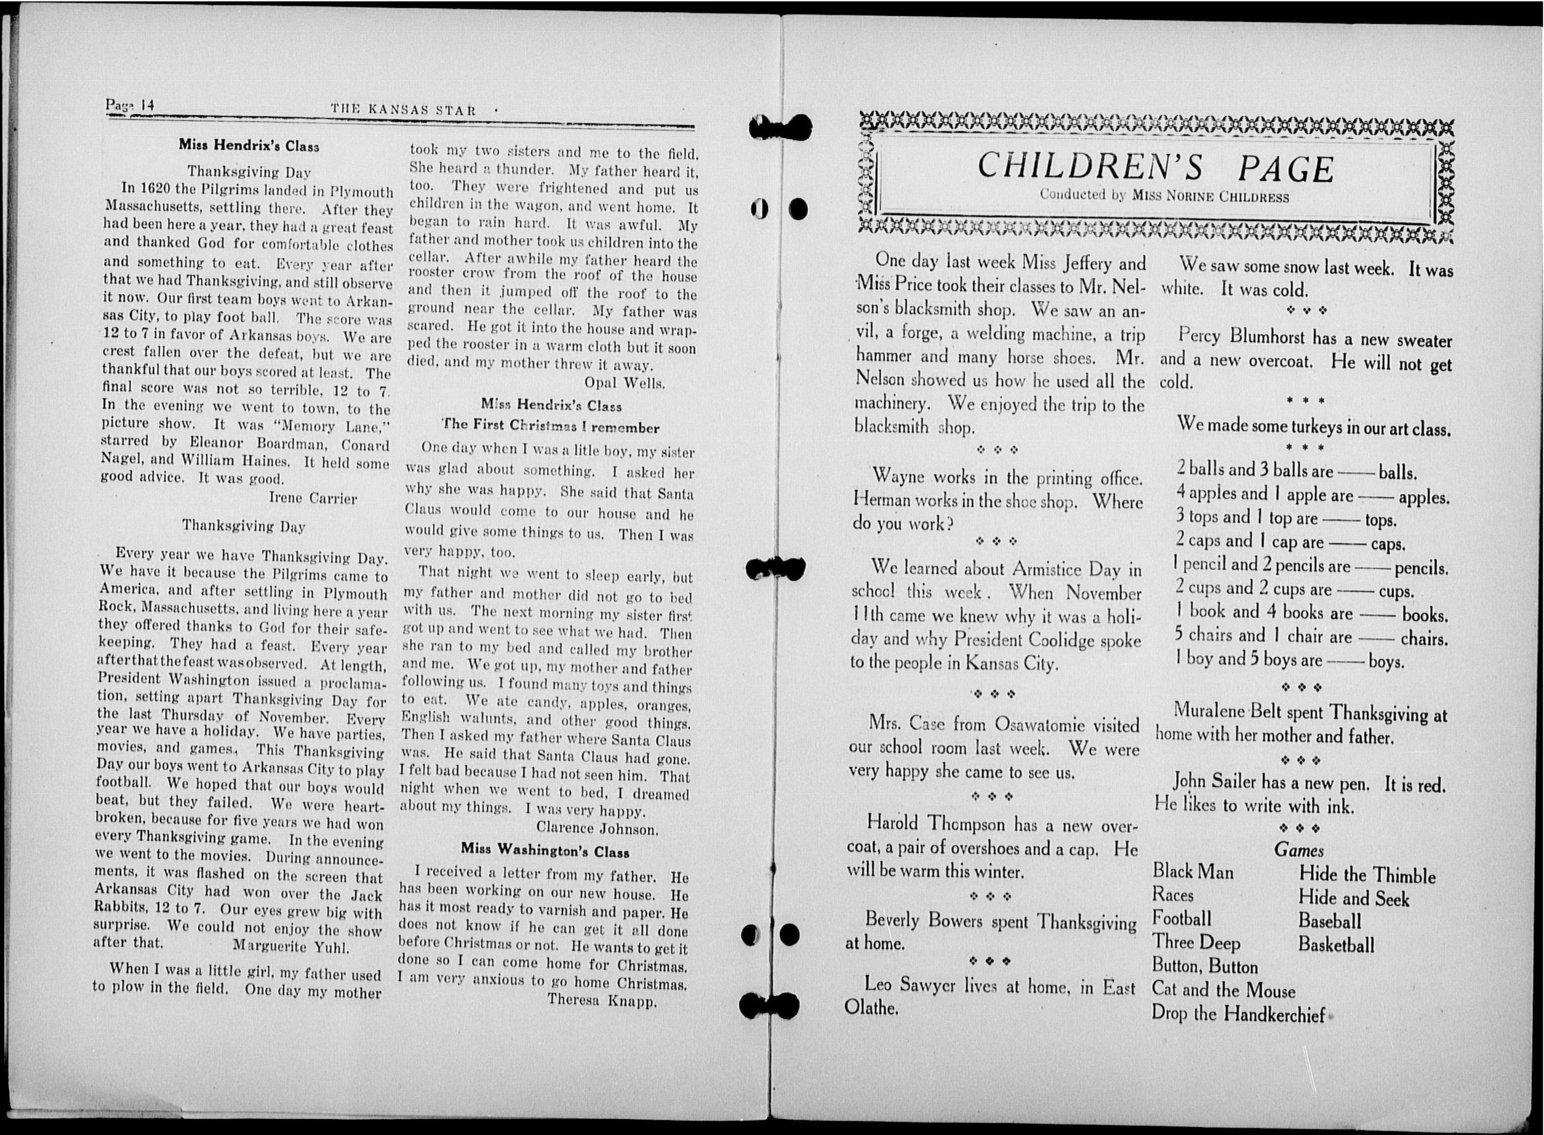 The Kansas Star, volume 50, number 6 - 14-15